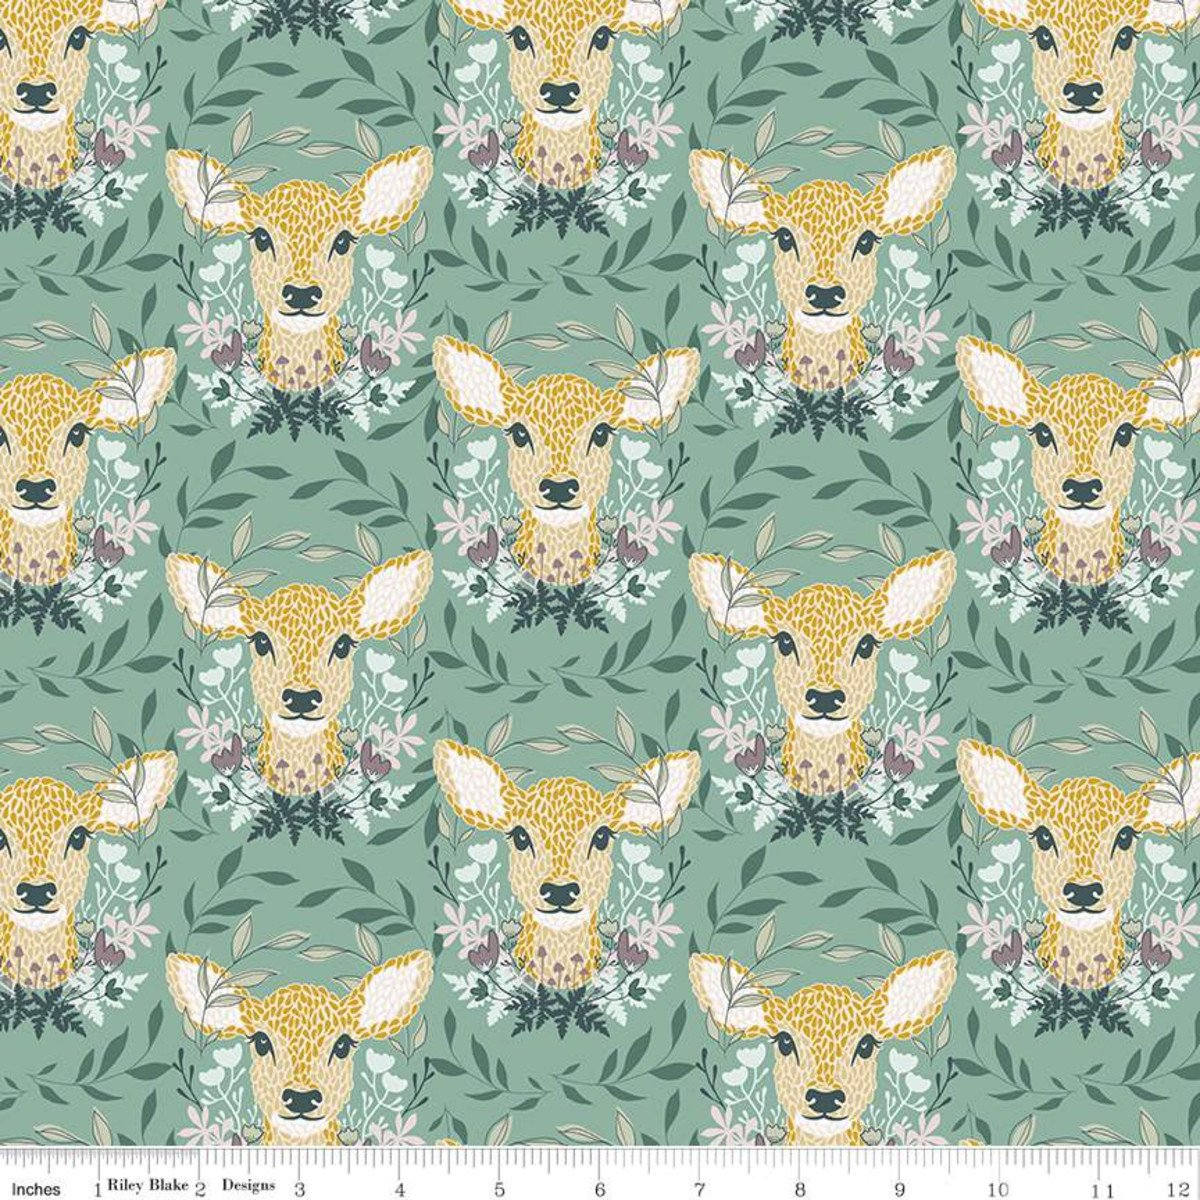 Harmony - Oh Deer - Seafoam 11091